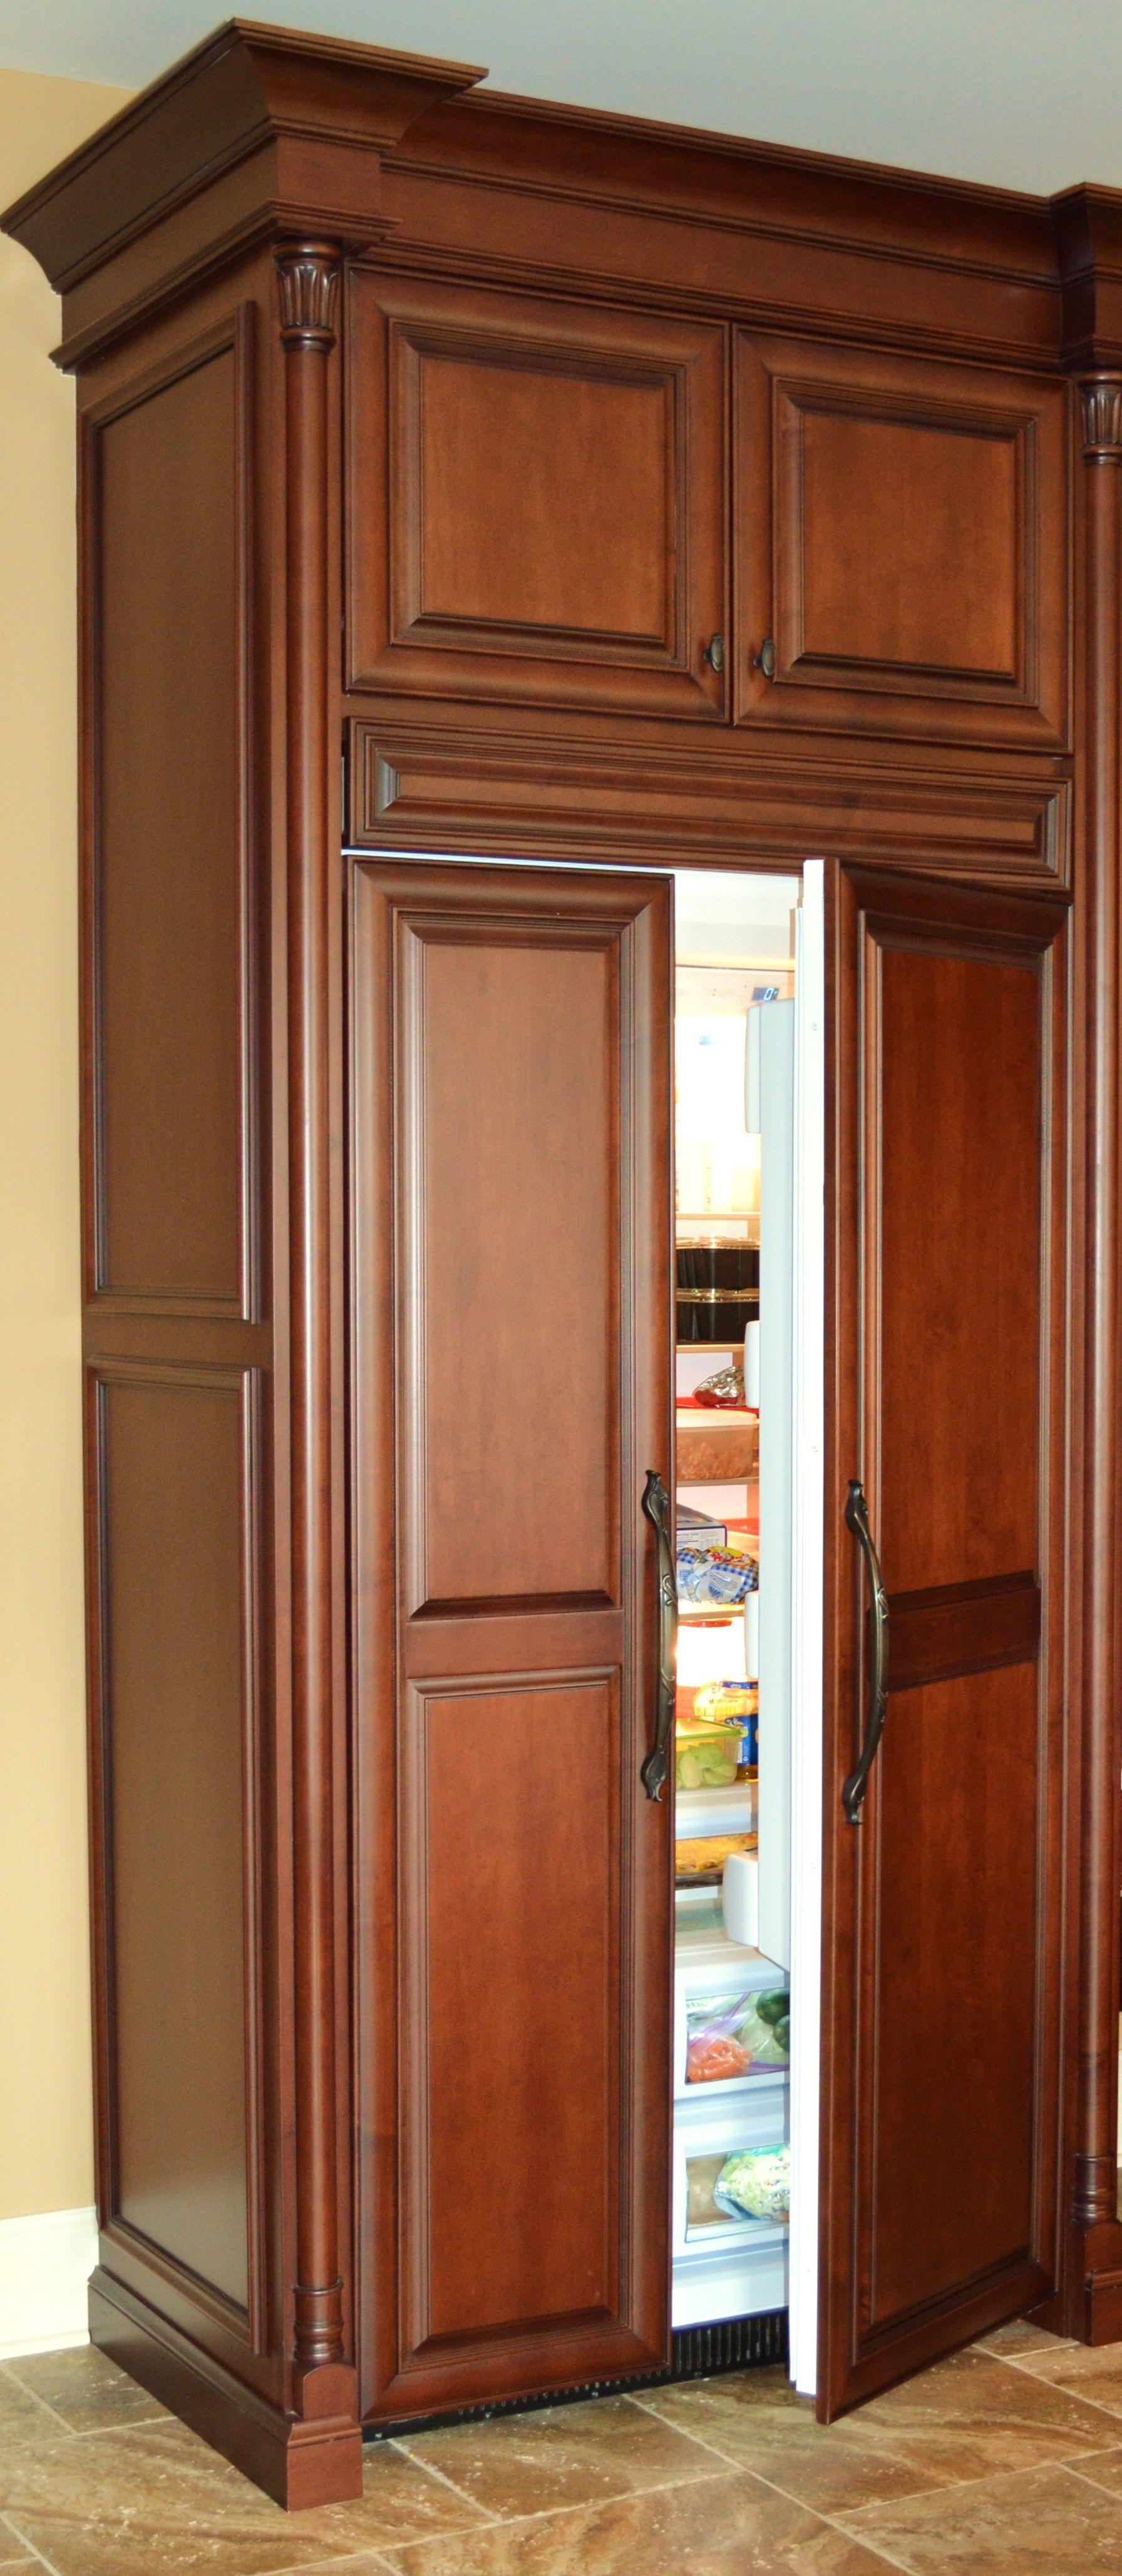 Wood Panel Refrigerator Modern Refrigerators Cabinet Doors Refrigerator Cabinet